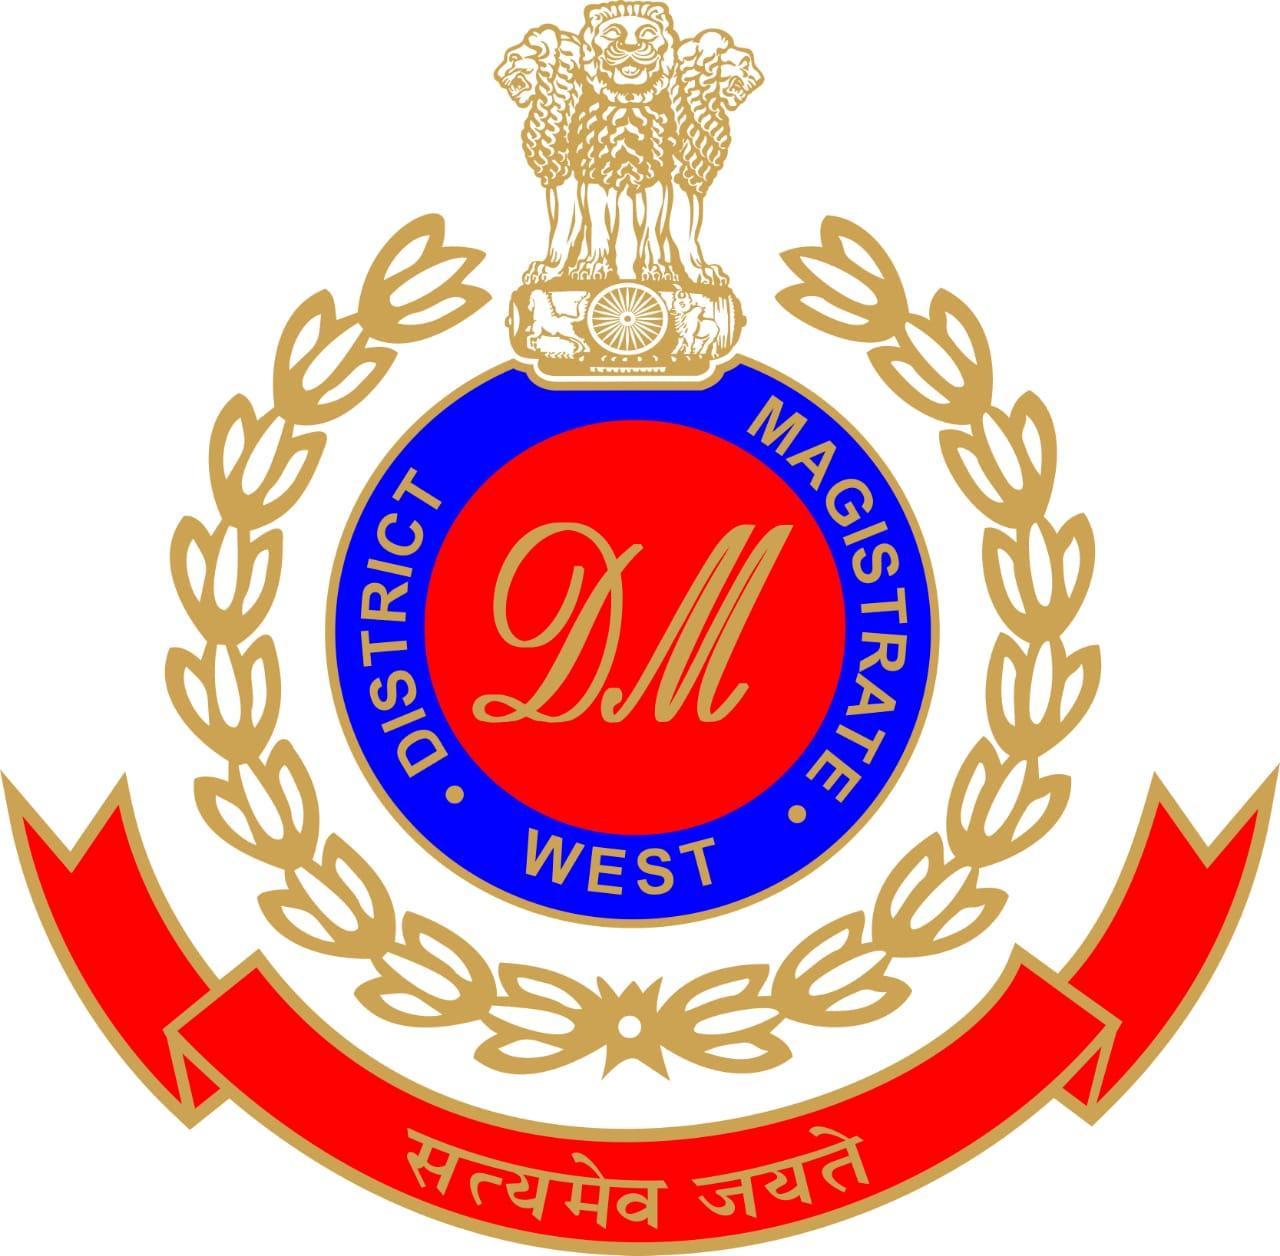 DM-west-logo.jpg